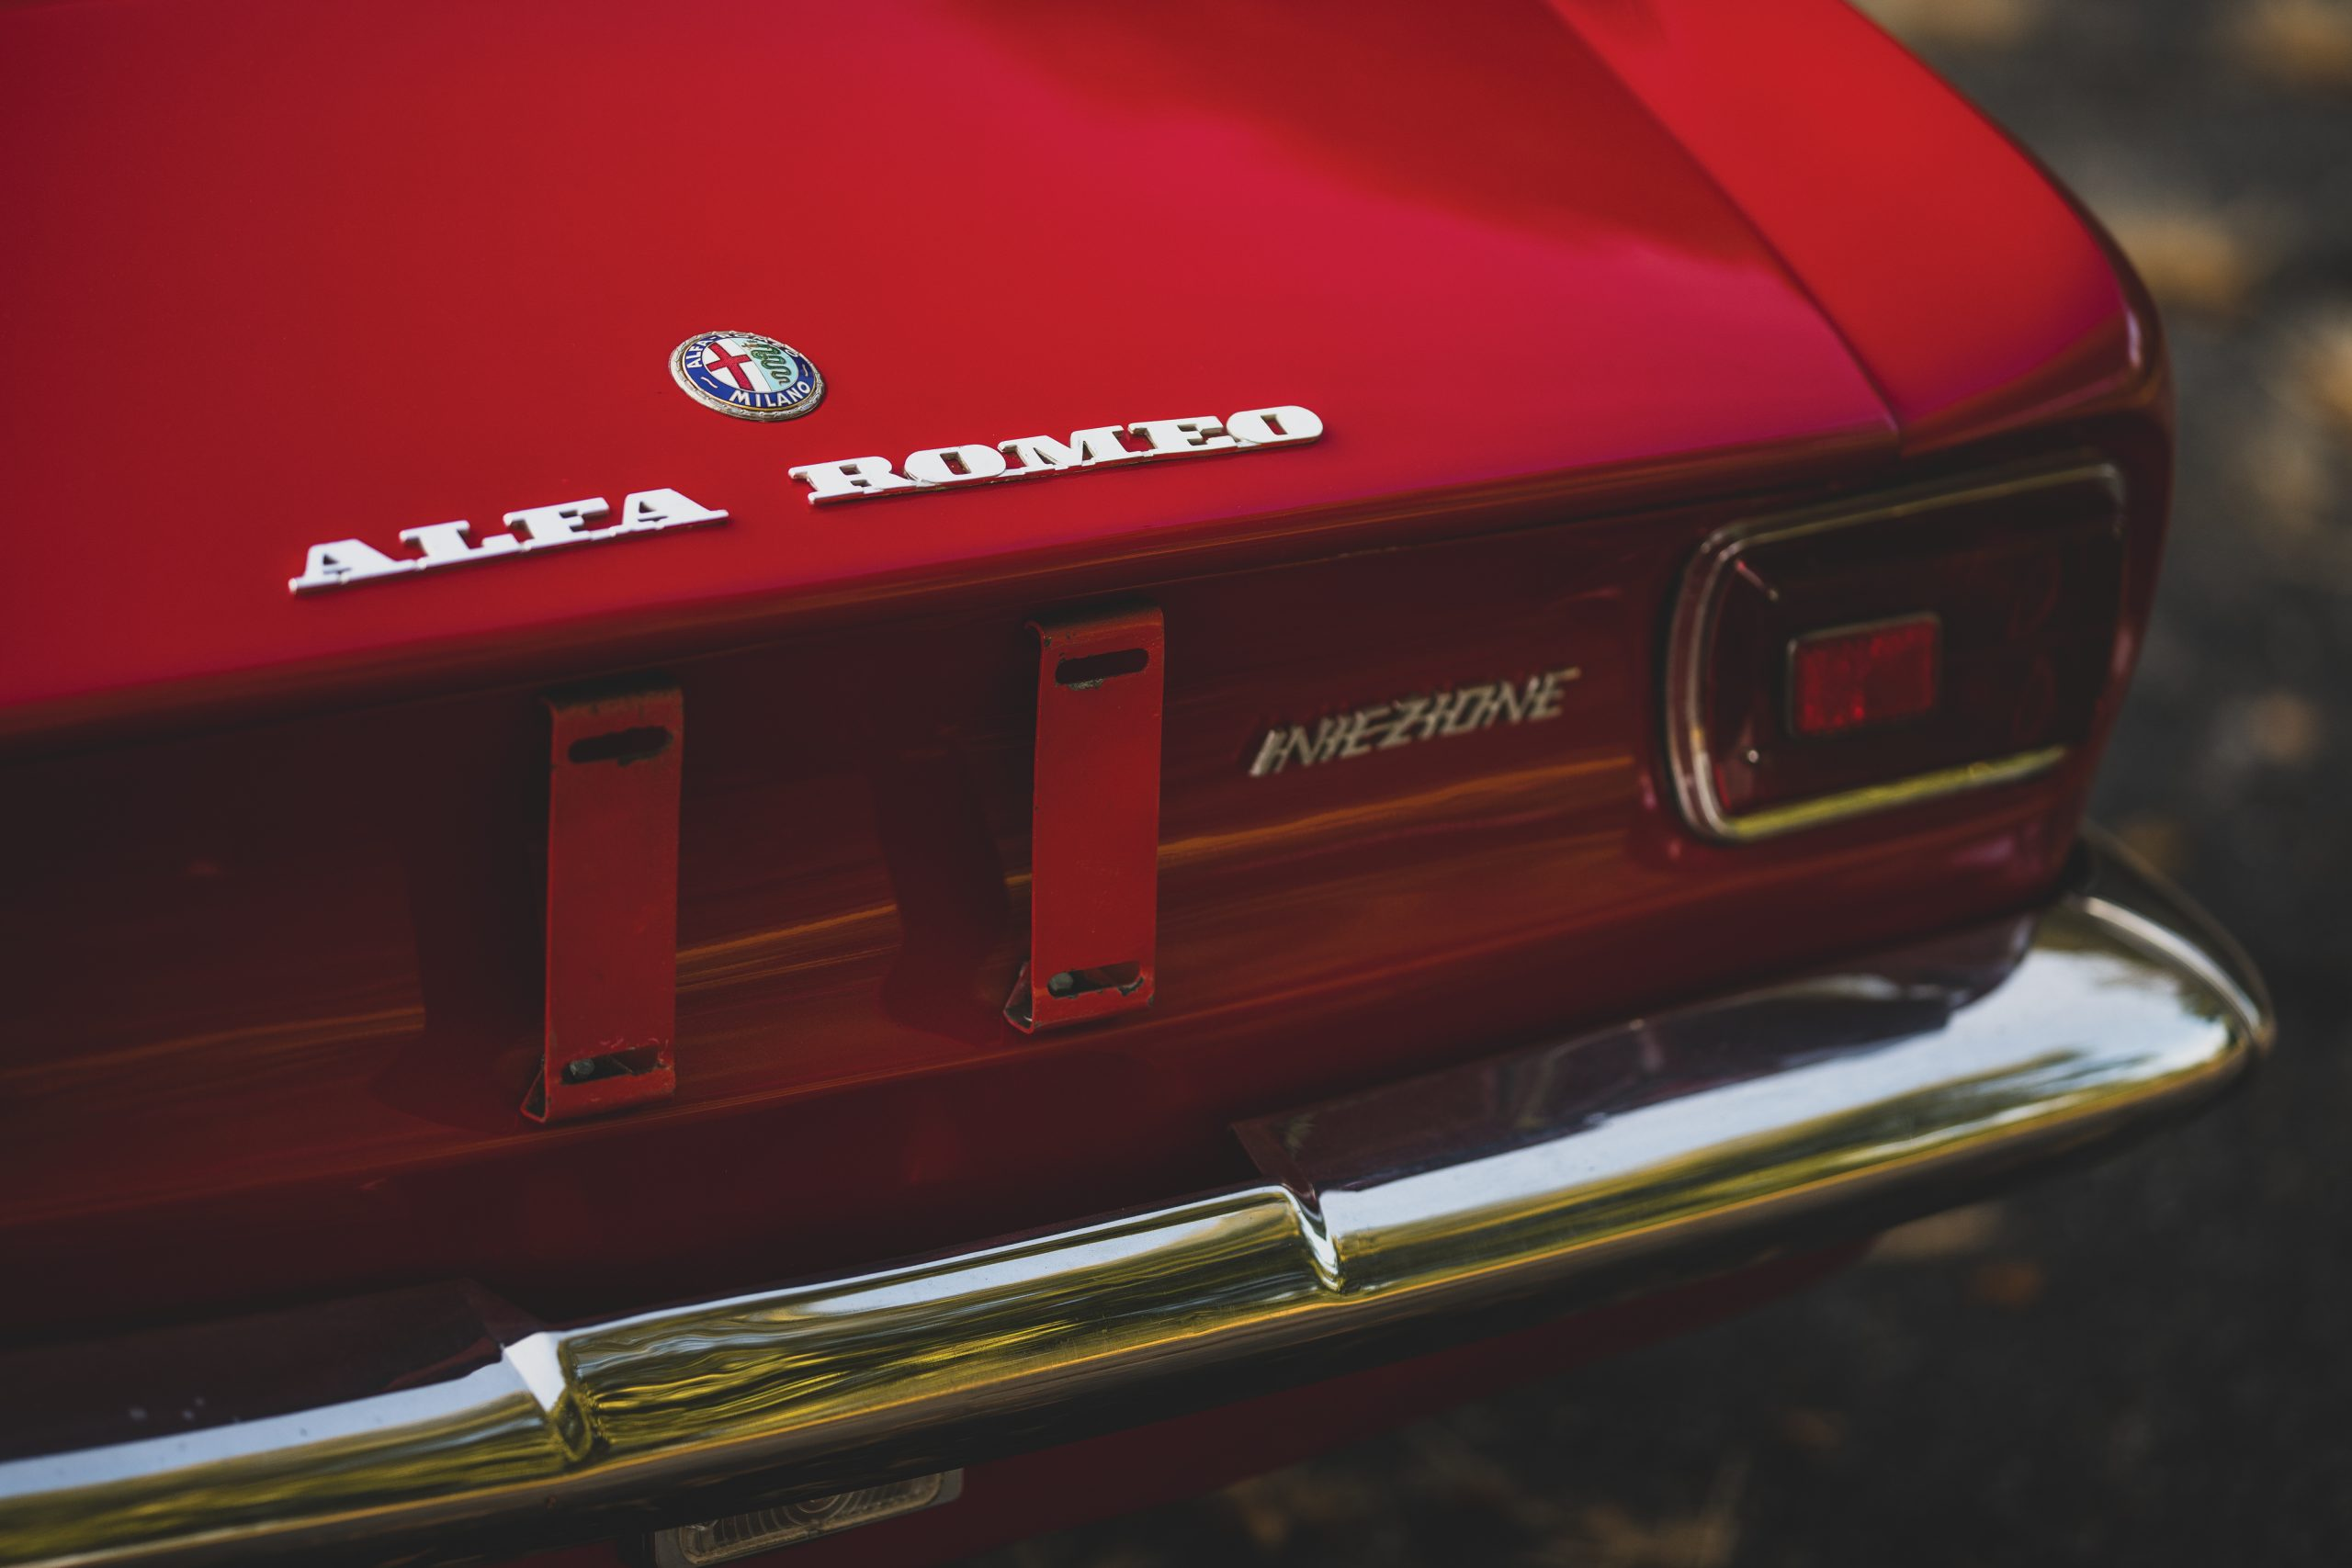 1969-Alfa-Romeo-1750-GT-Veloce rear badging